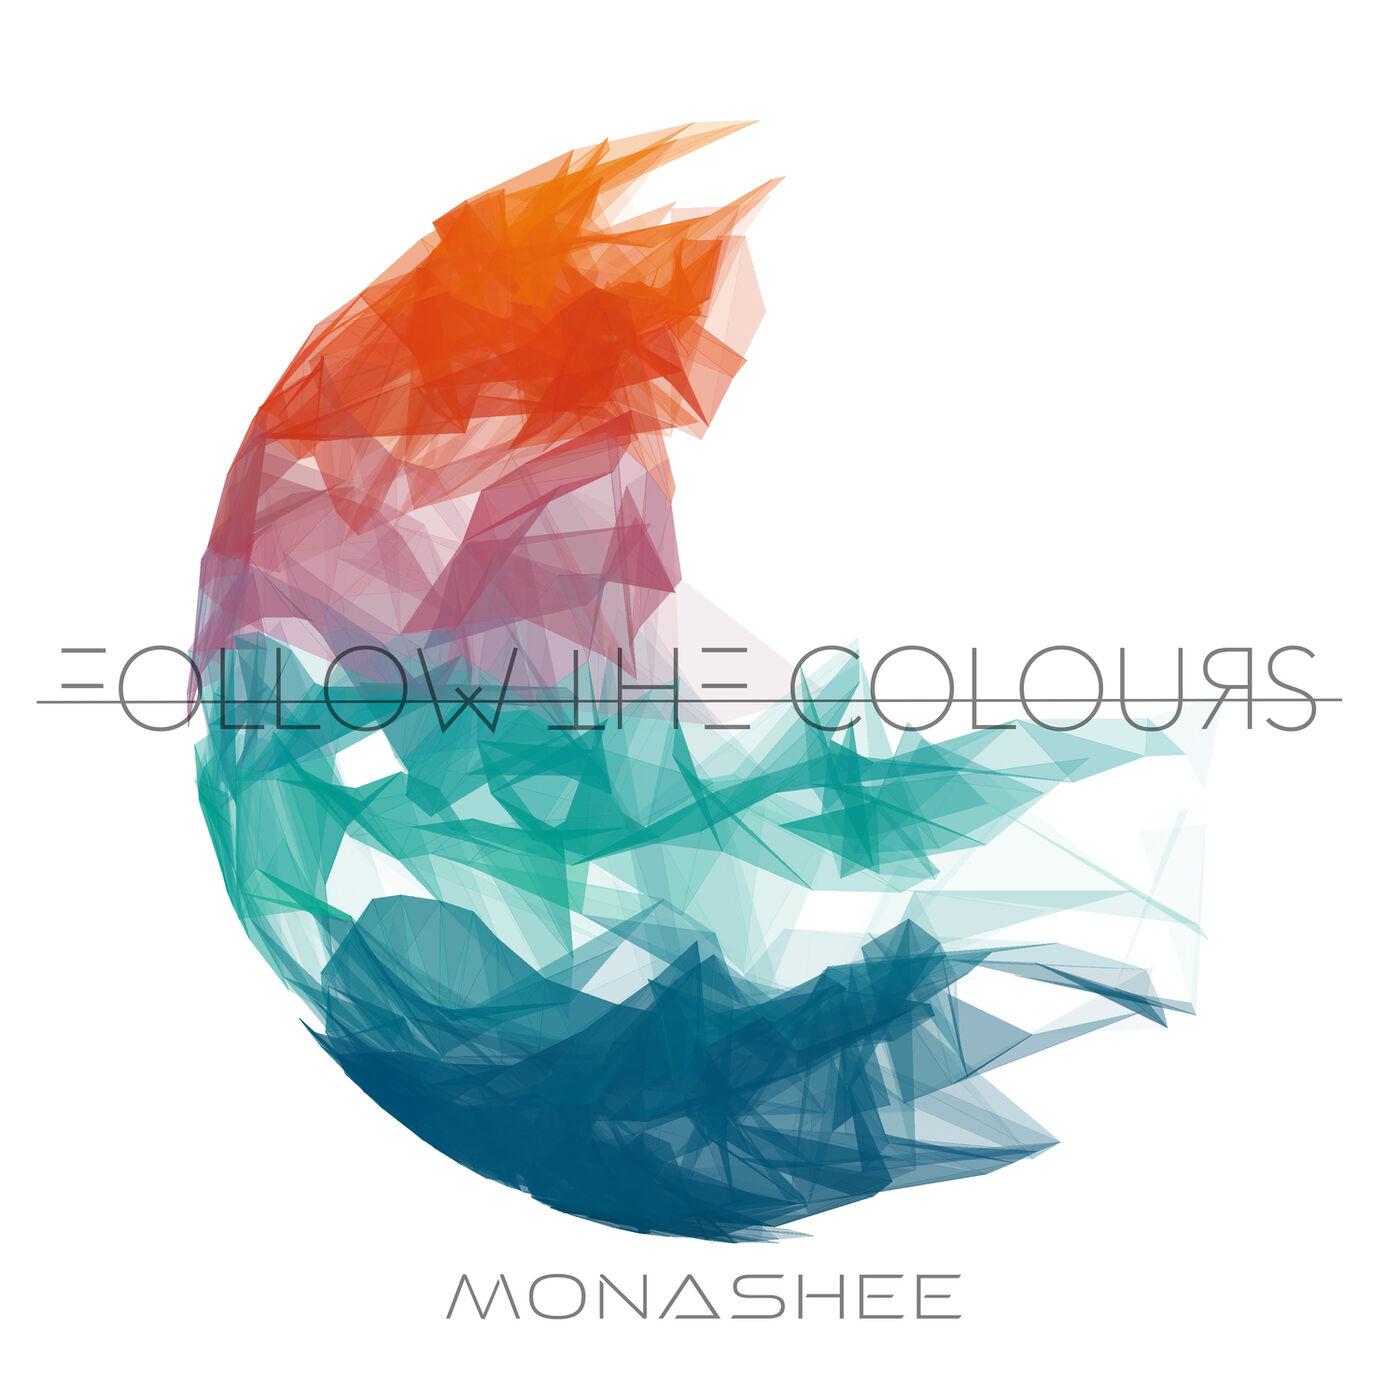 Monashee - Follow the Colours (2019)